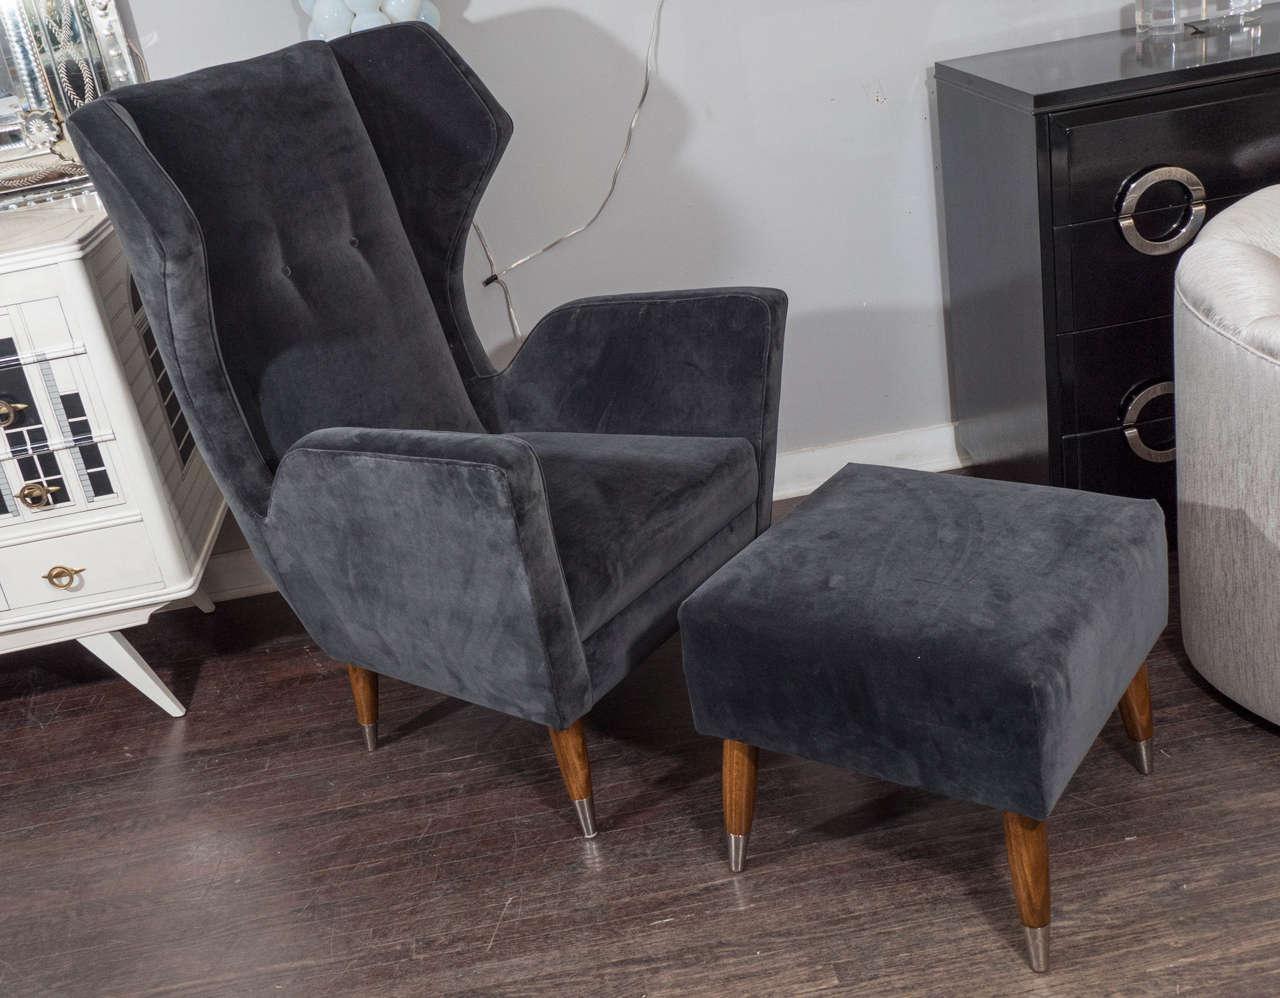 Custom Gio Ponti style chair and ottoman.